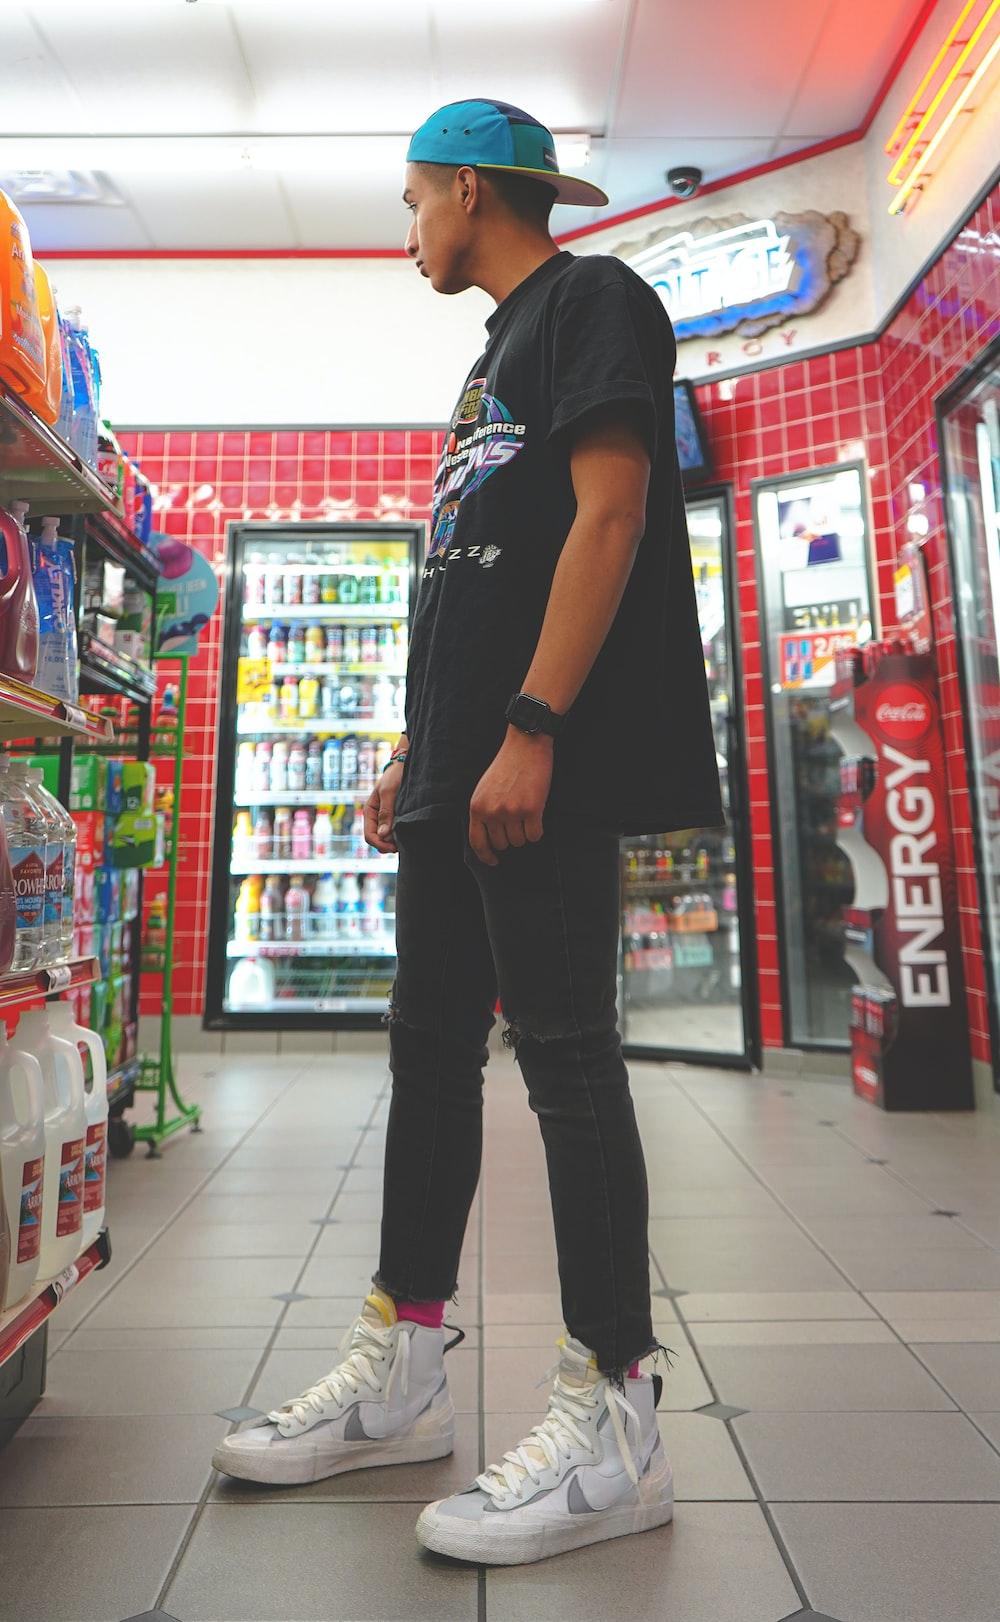 man in black t-shirt and blue denim jeans standing on white tiled floor